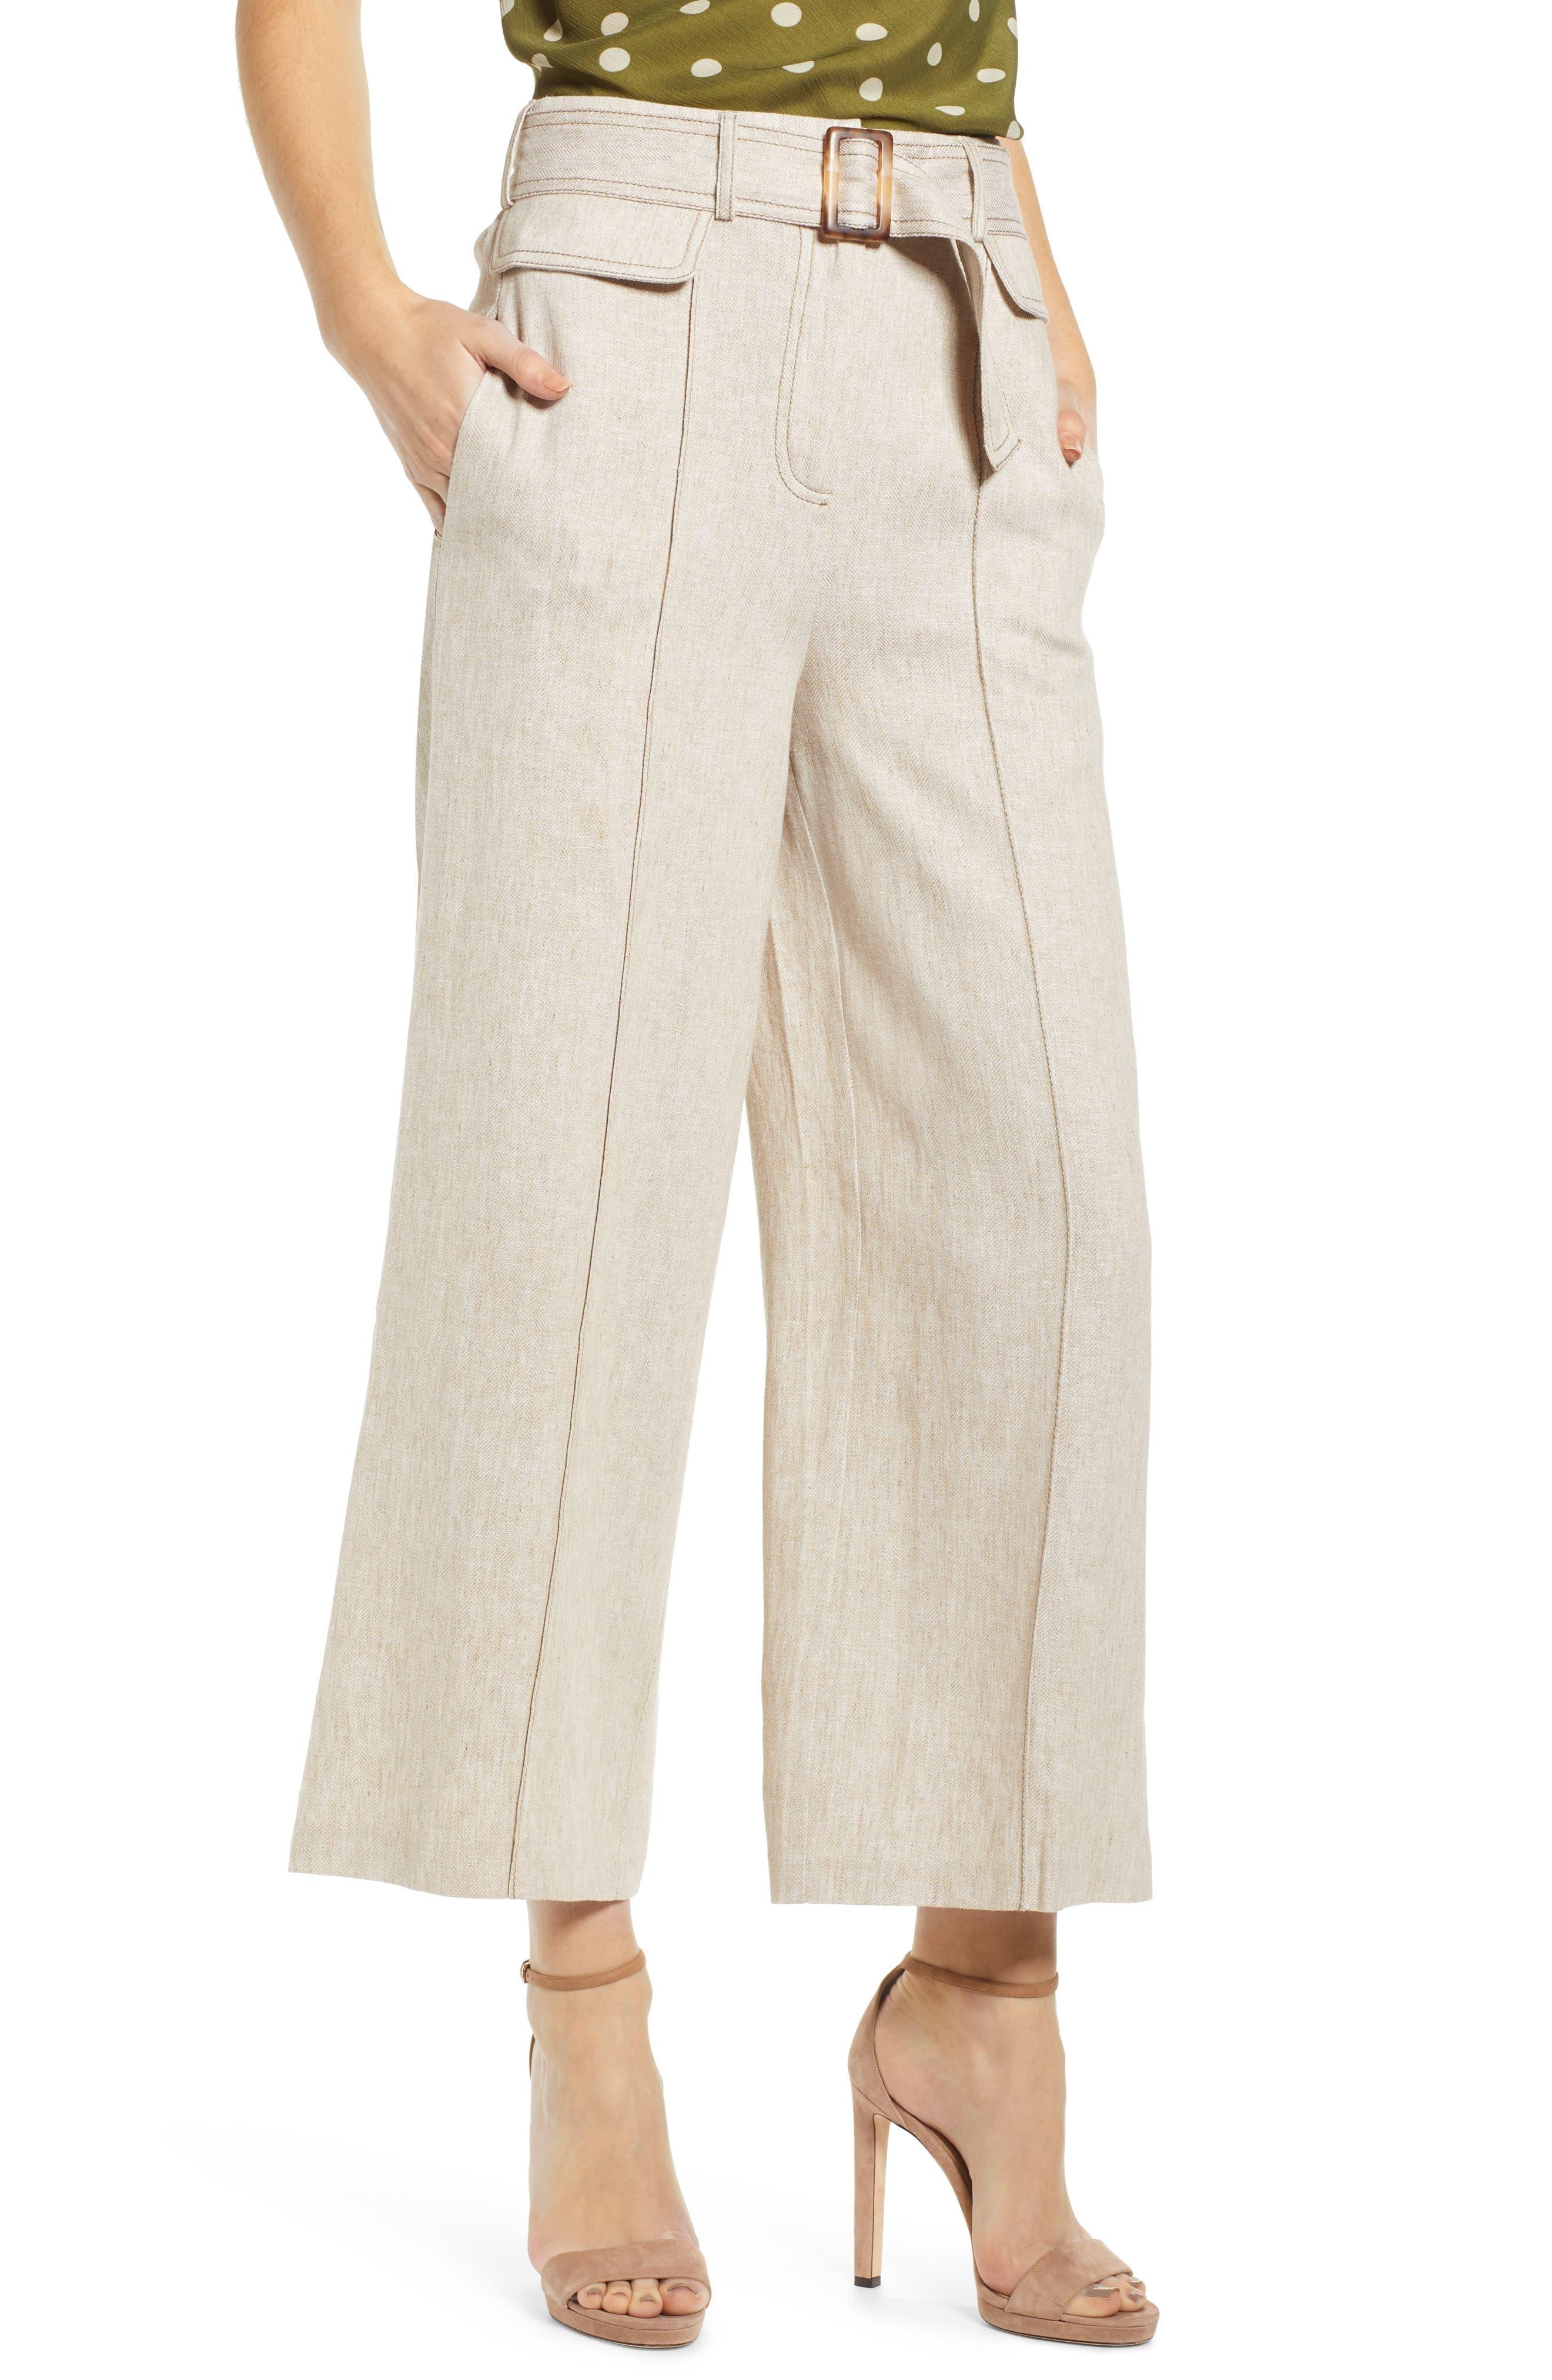 CHRISELLE LIM COLLECTION, Chriselle Lim Toulouse Wide Leg Crop Trousers, Main thumbnail 1, color, OATMEAL